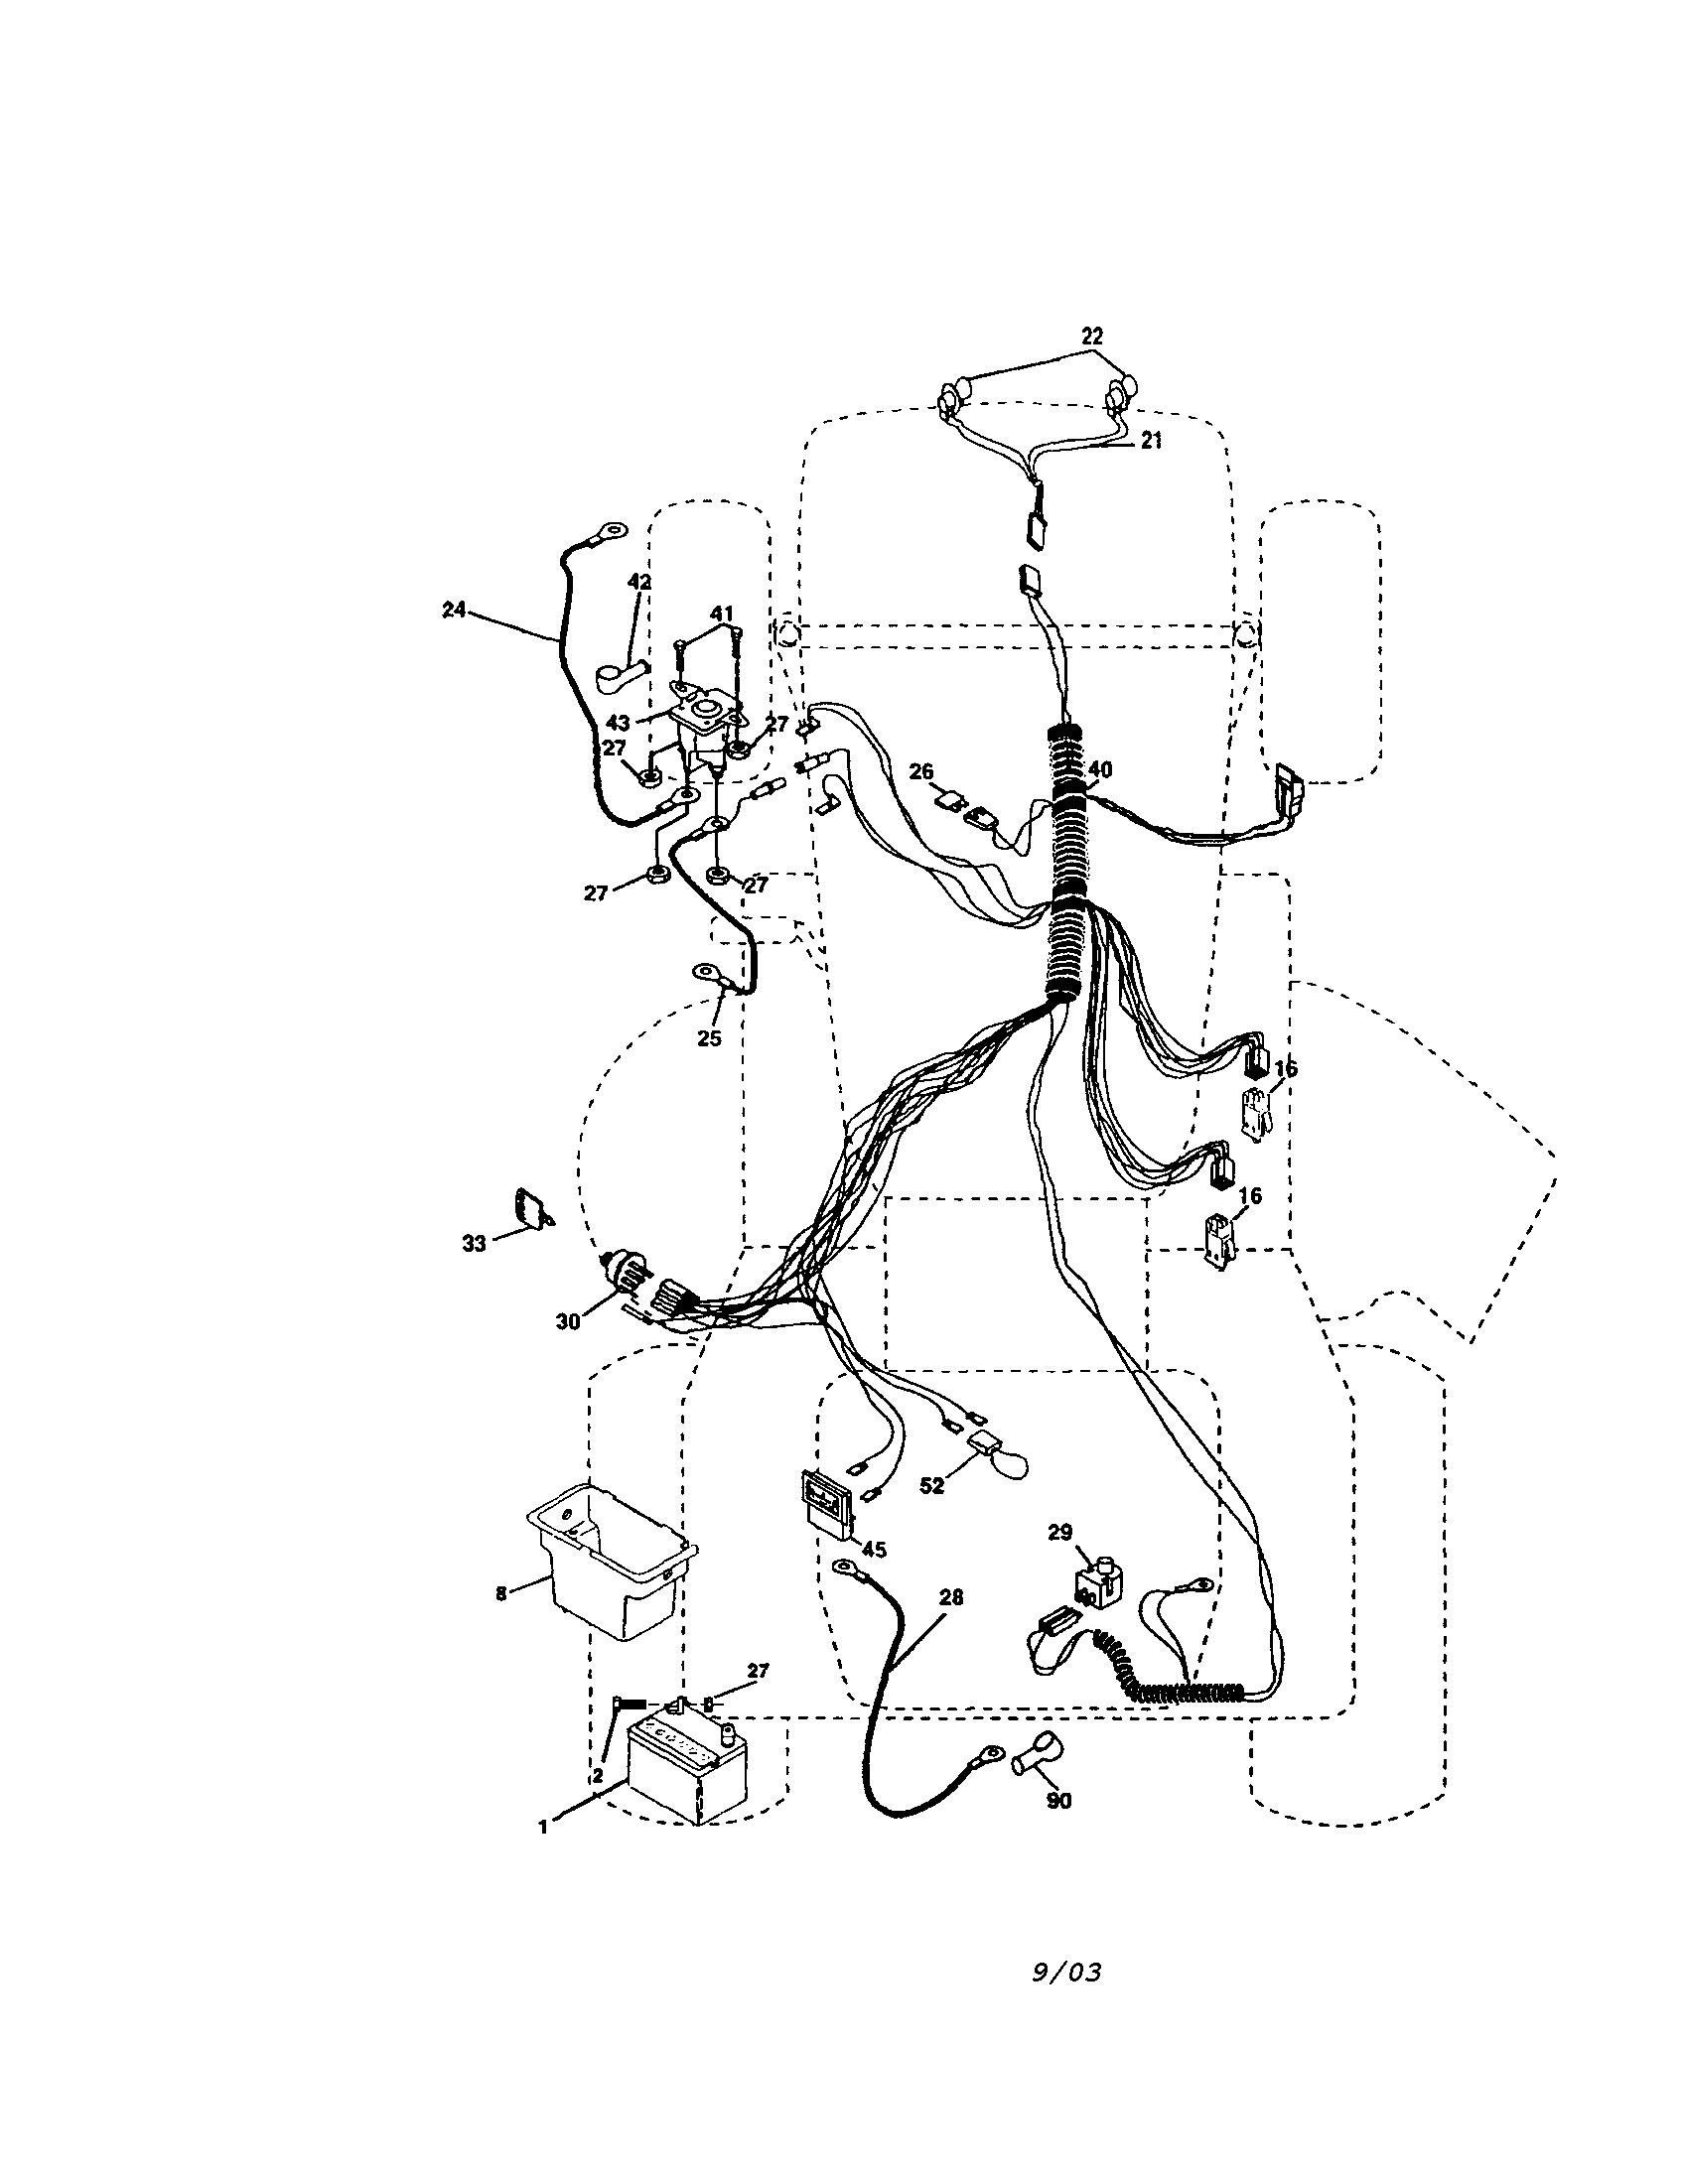 Craftsman lawn tractor wiring diagram mtd lawn mower wiring